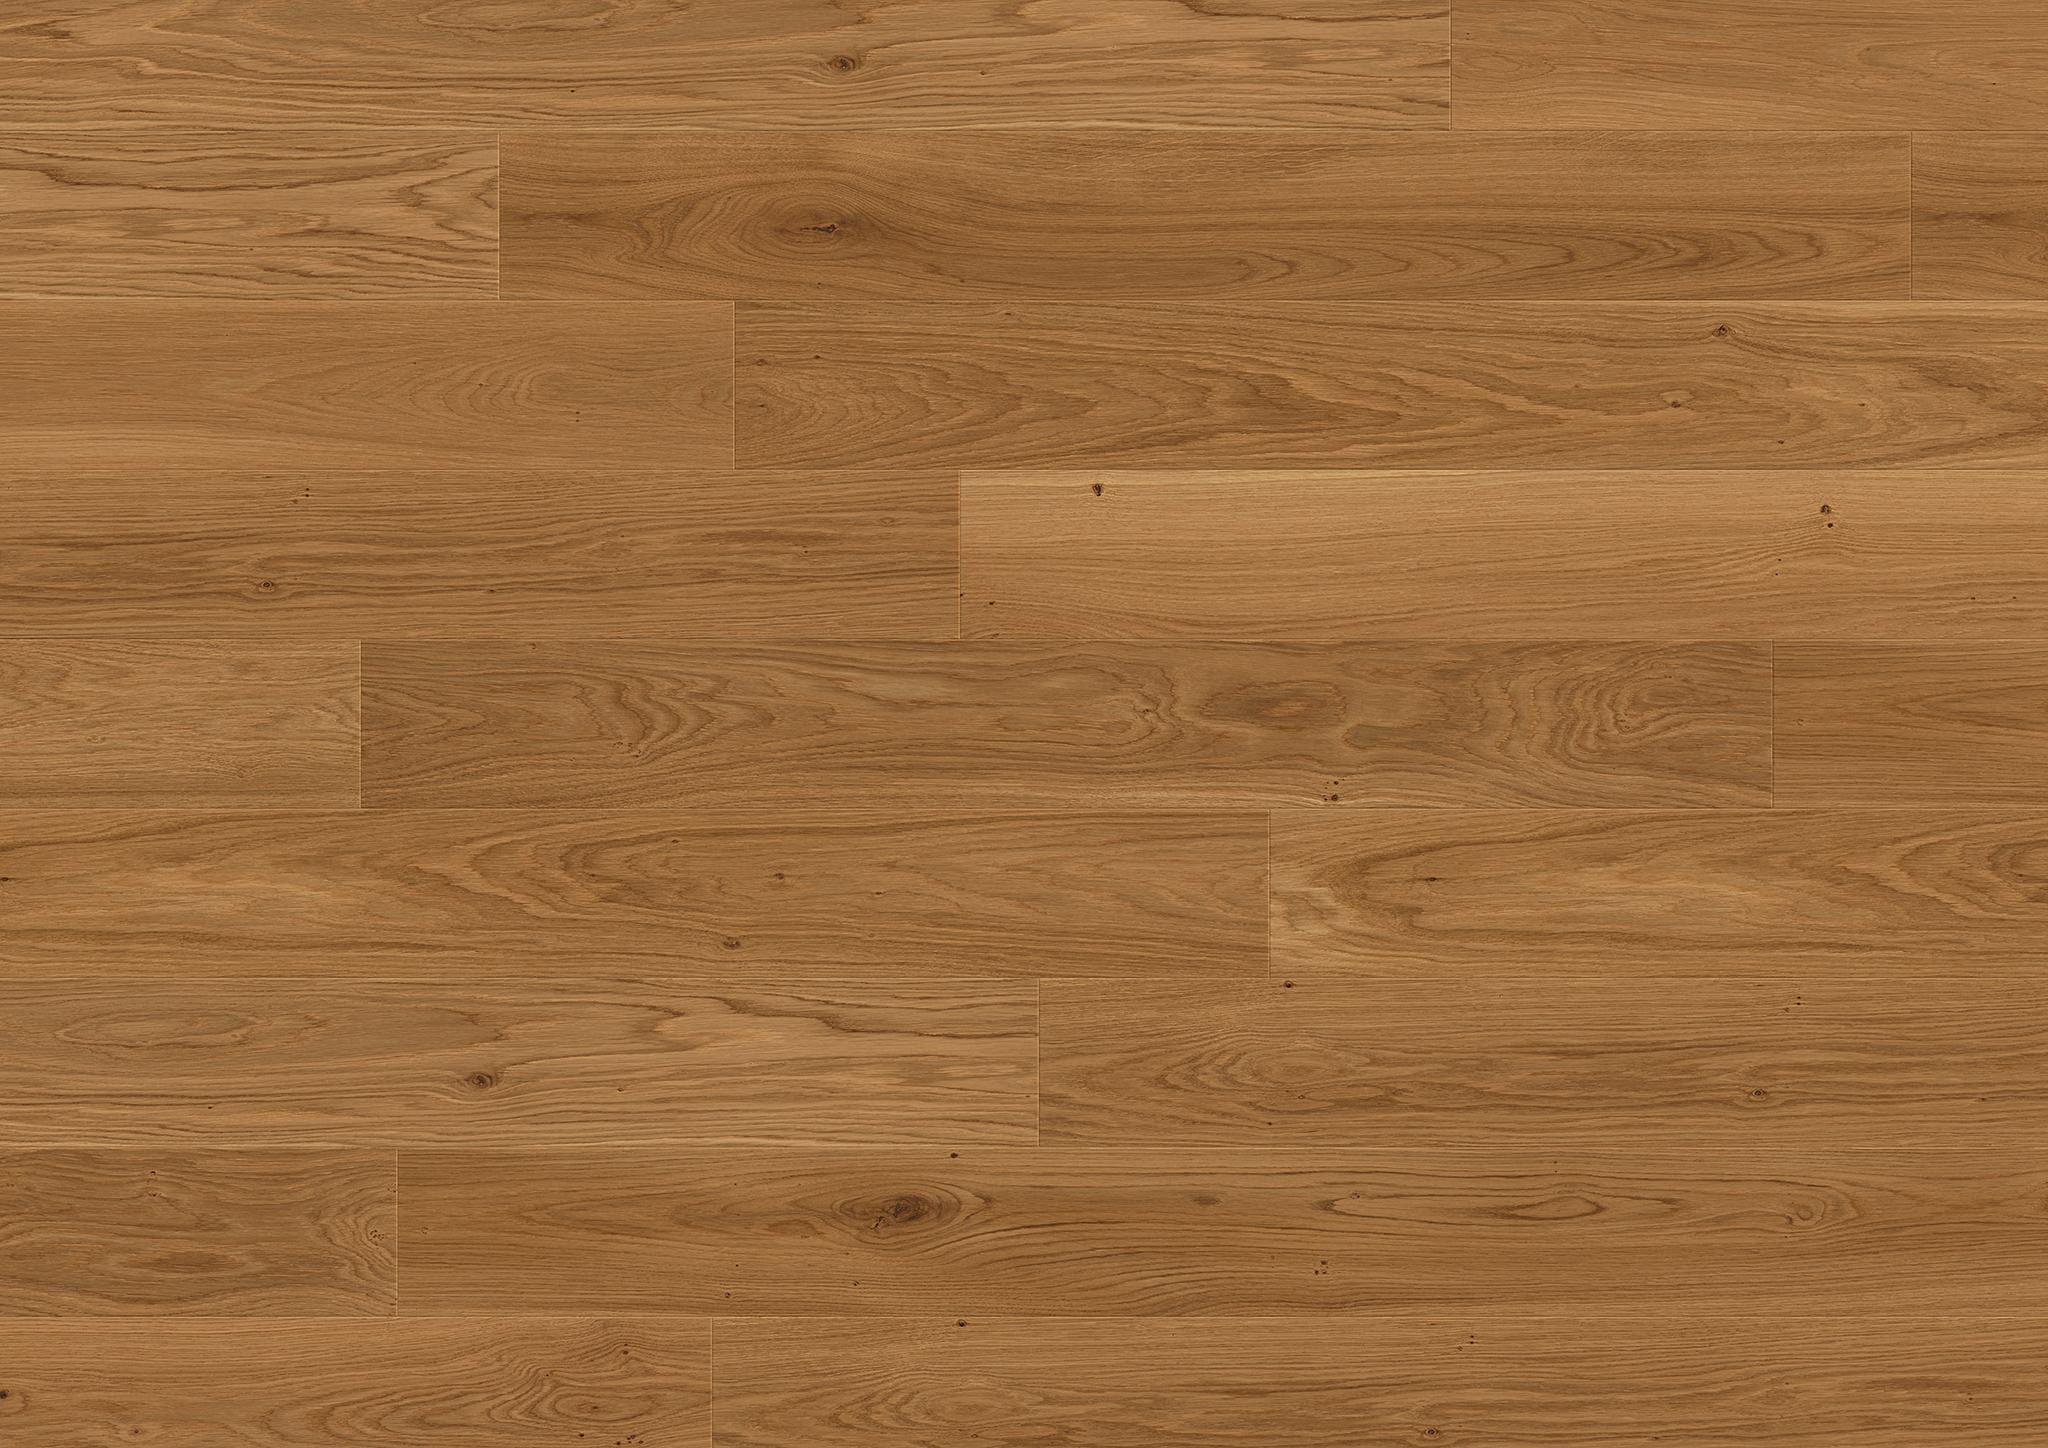 Floor Art Da Vinci Dub svetly Markant